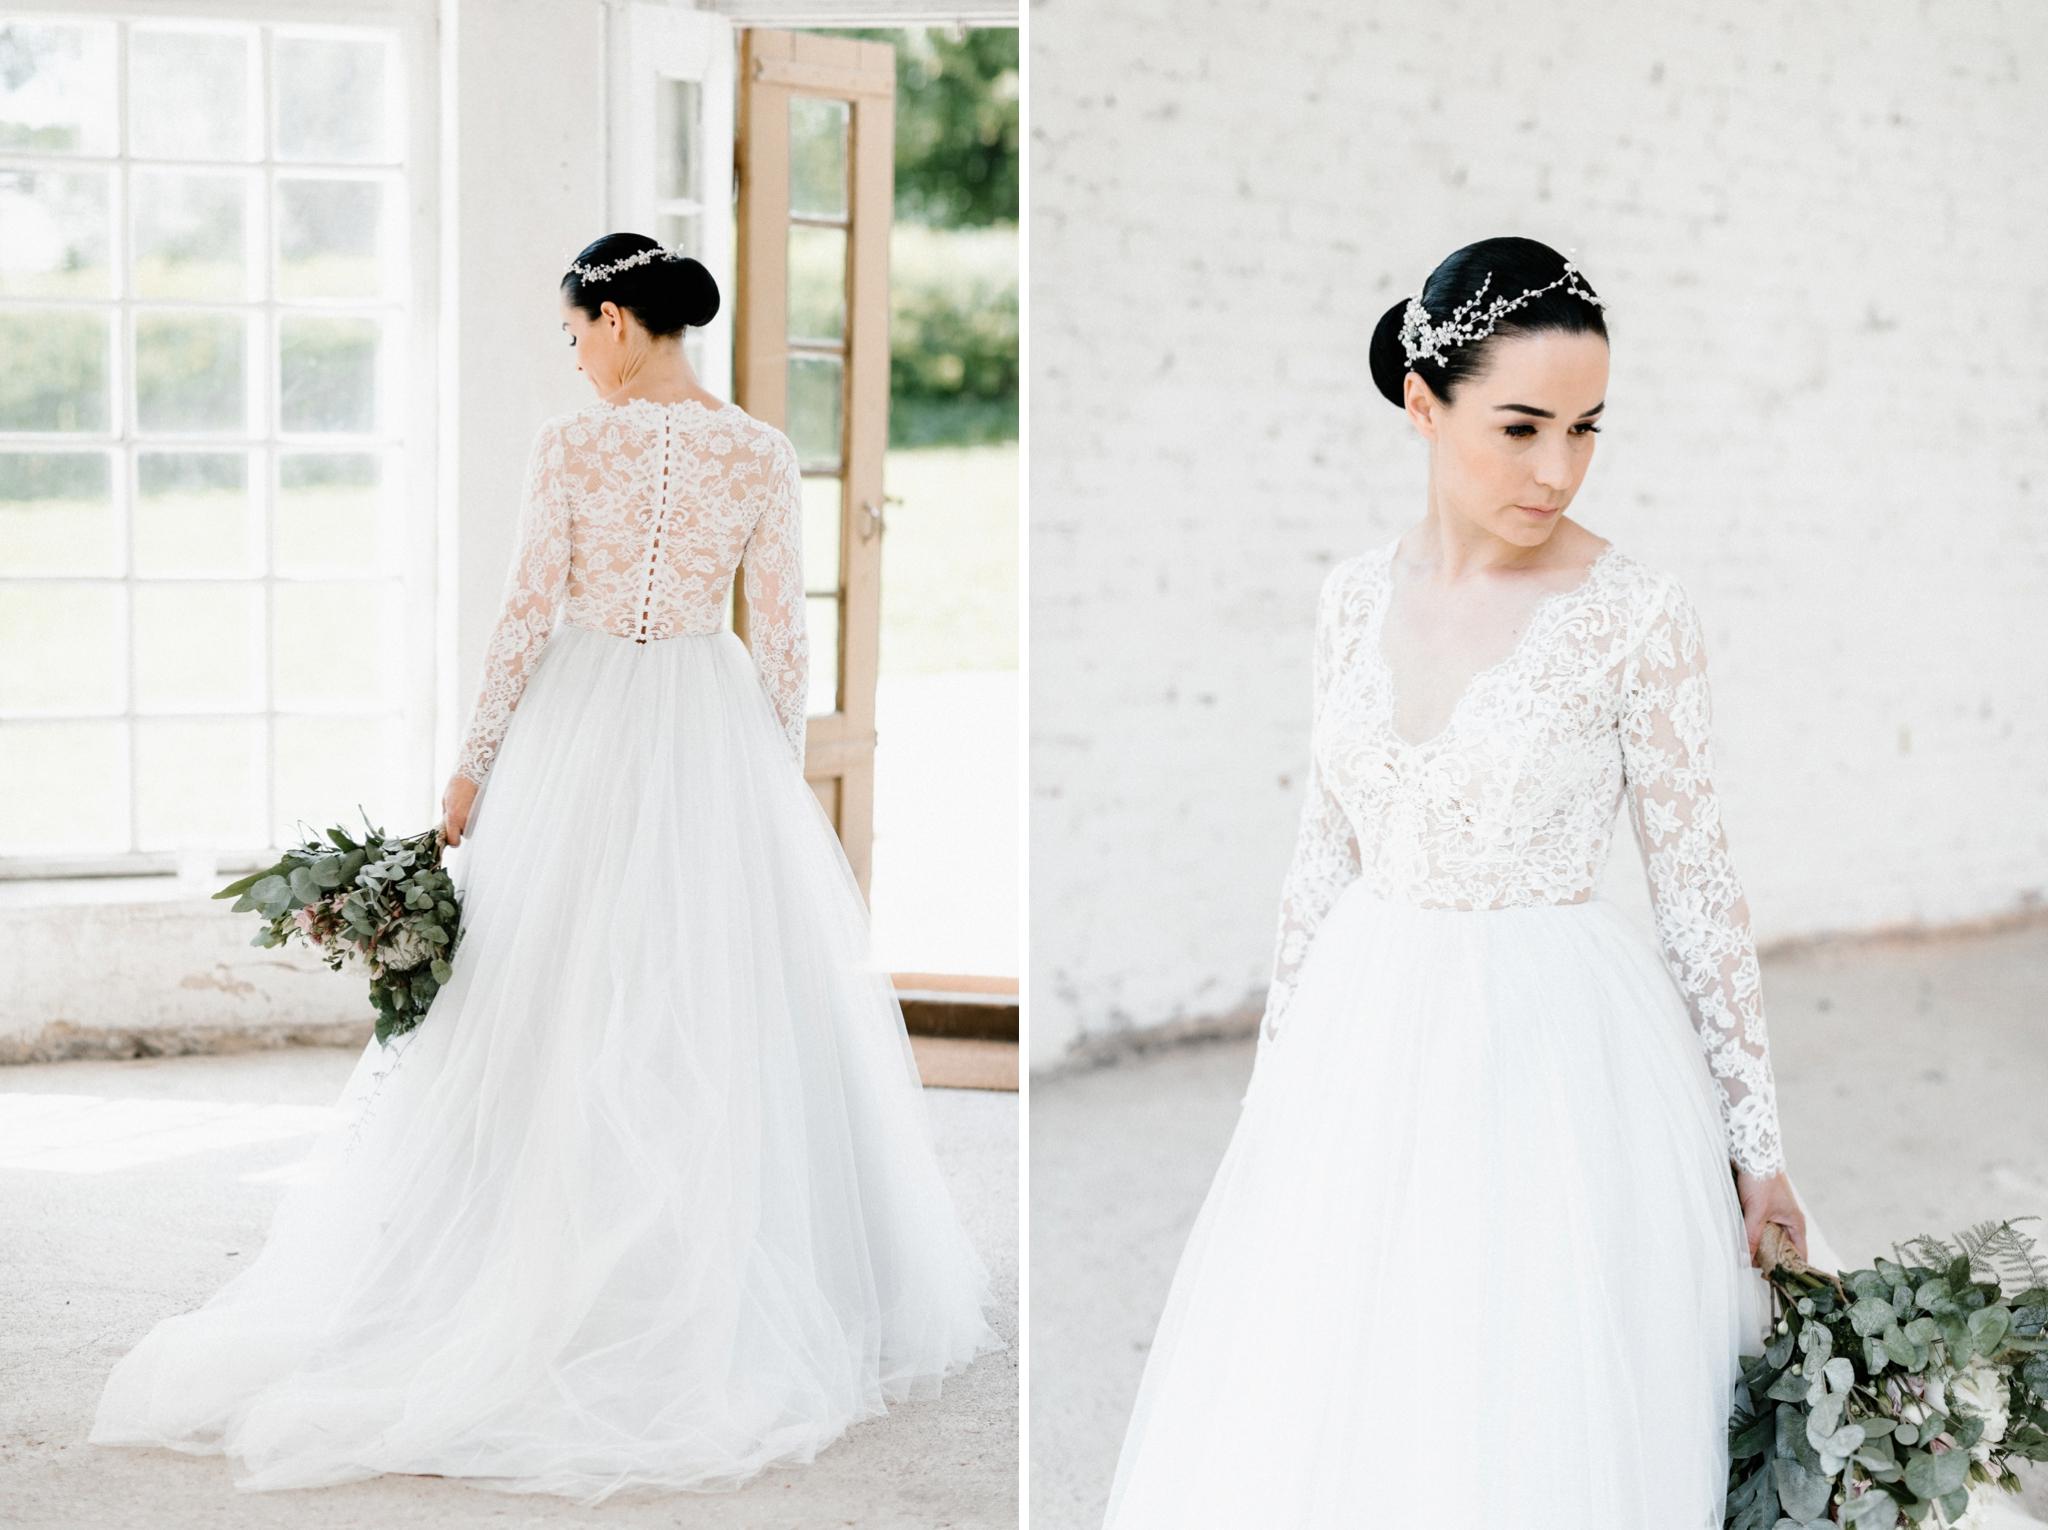 Essi + Ville   Oitbacka Gården   by Patrick Karkkolainen Wedding Photography-81.jpg